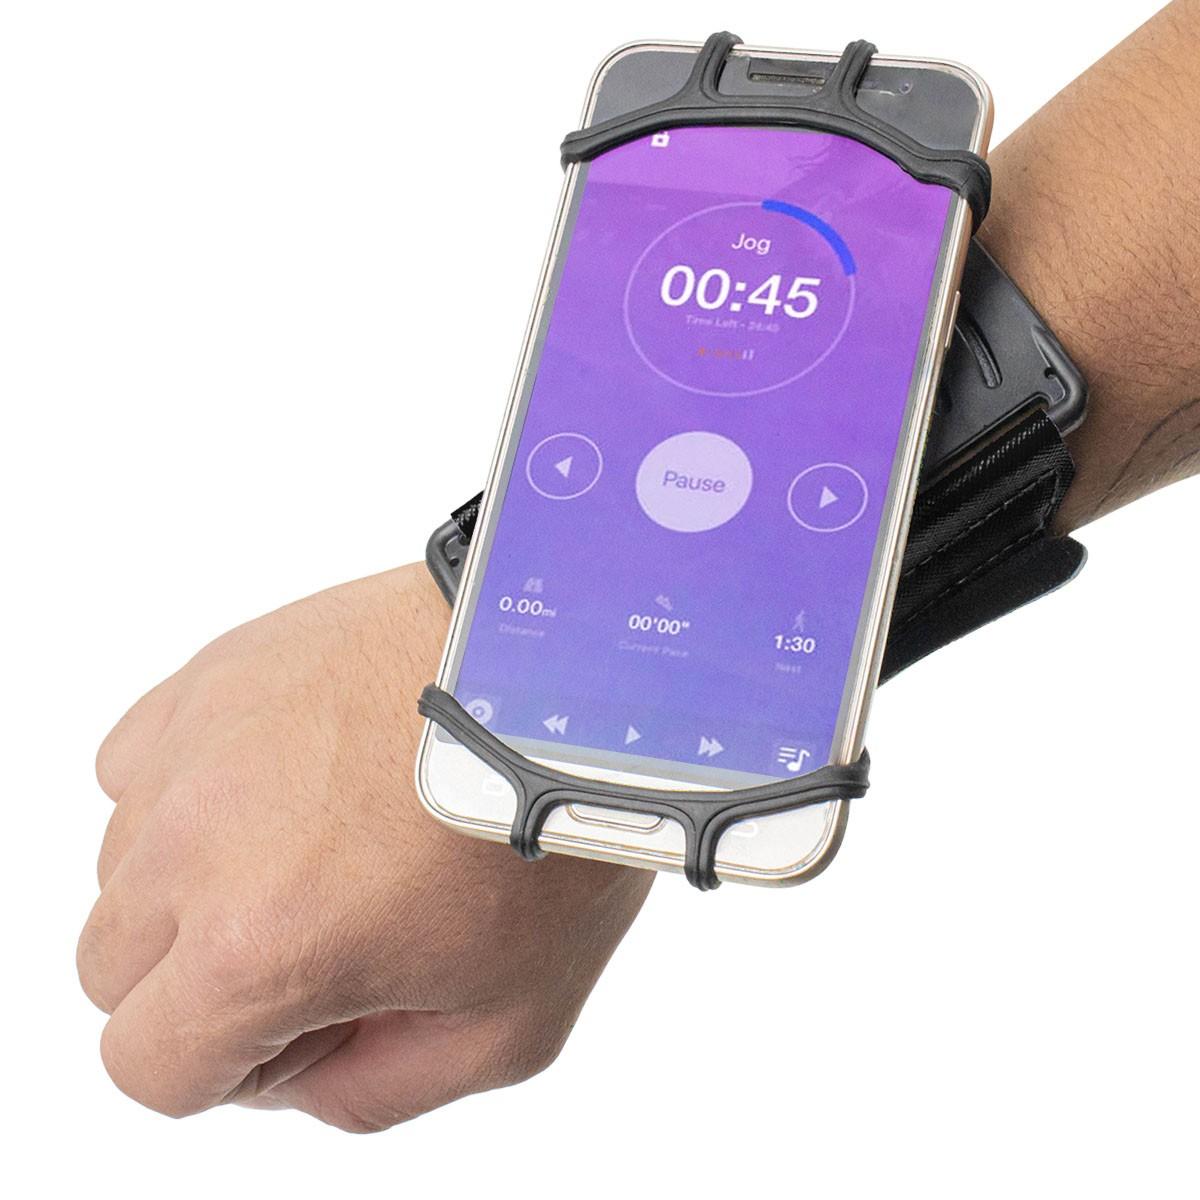 Suporte Porta Celular de Pulso 360 graus Wristband MBfit MB57109